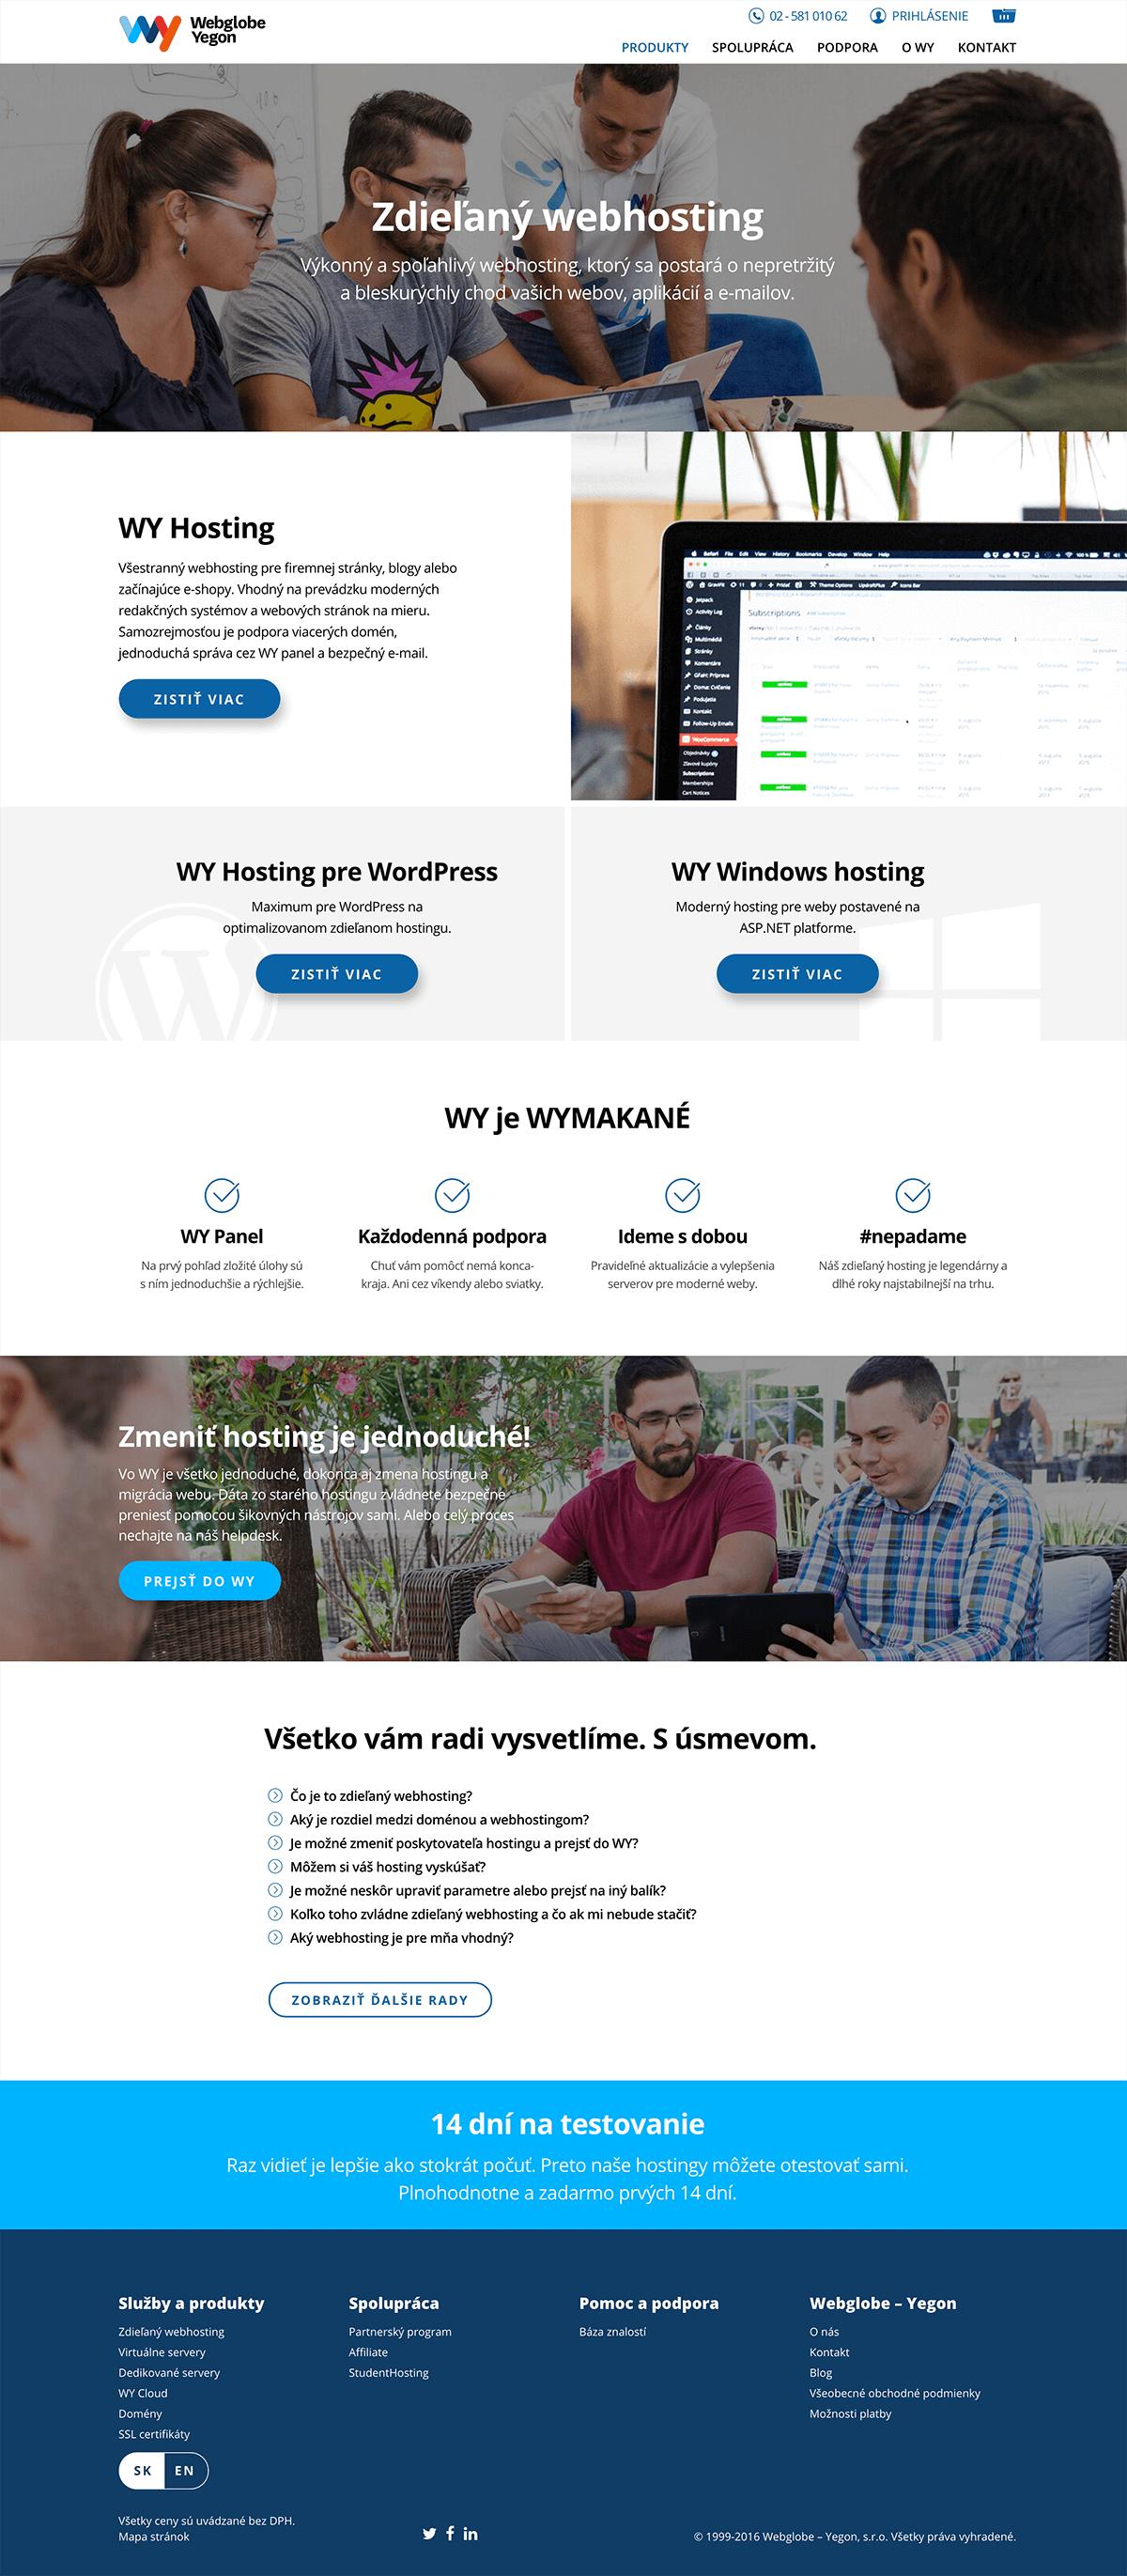 zdielany-webhosting-wy